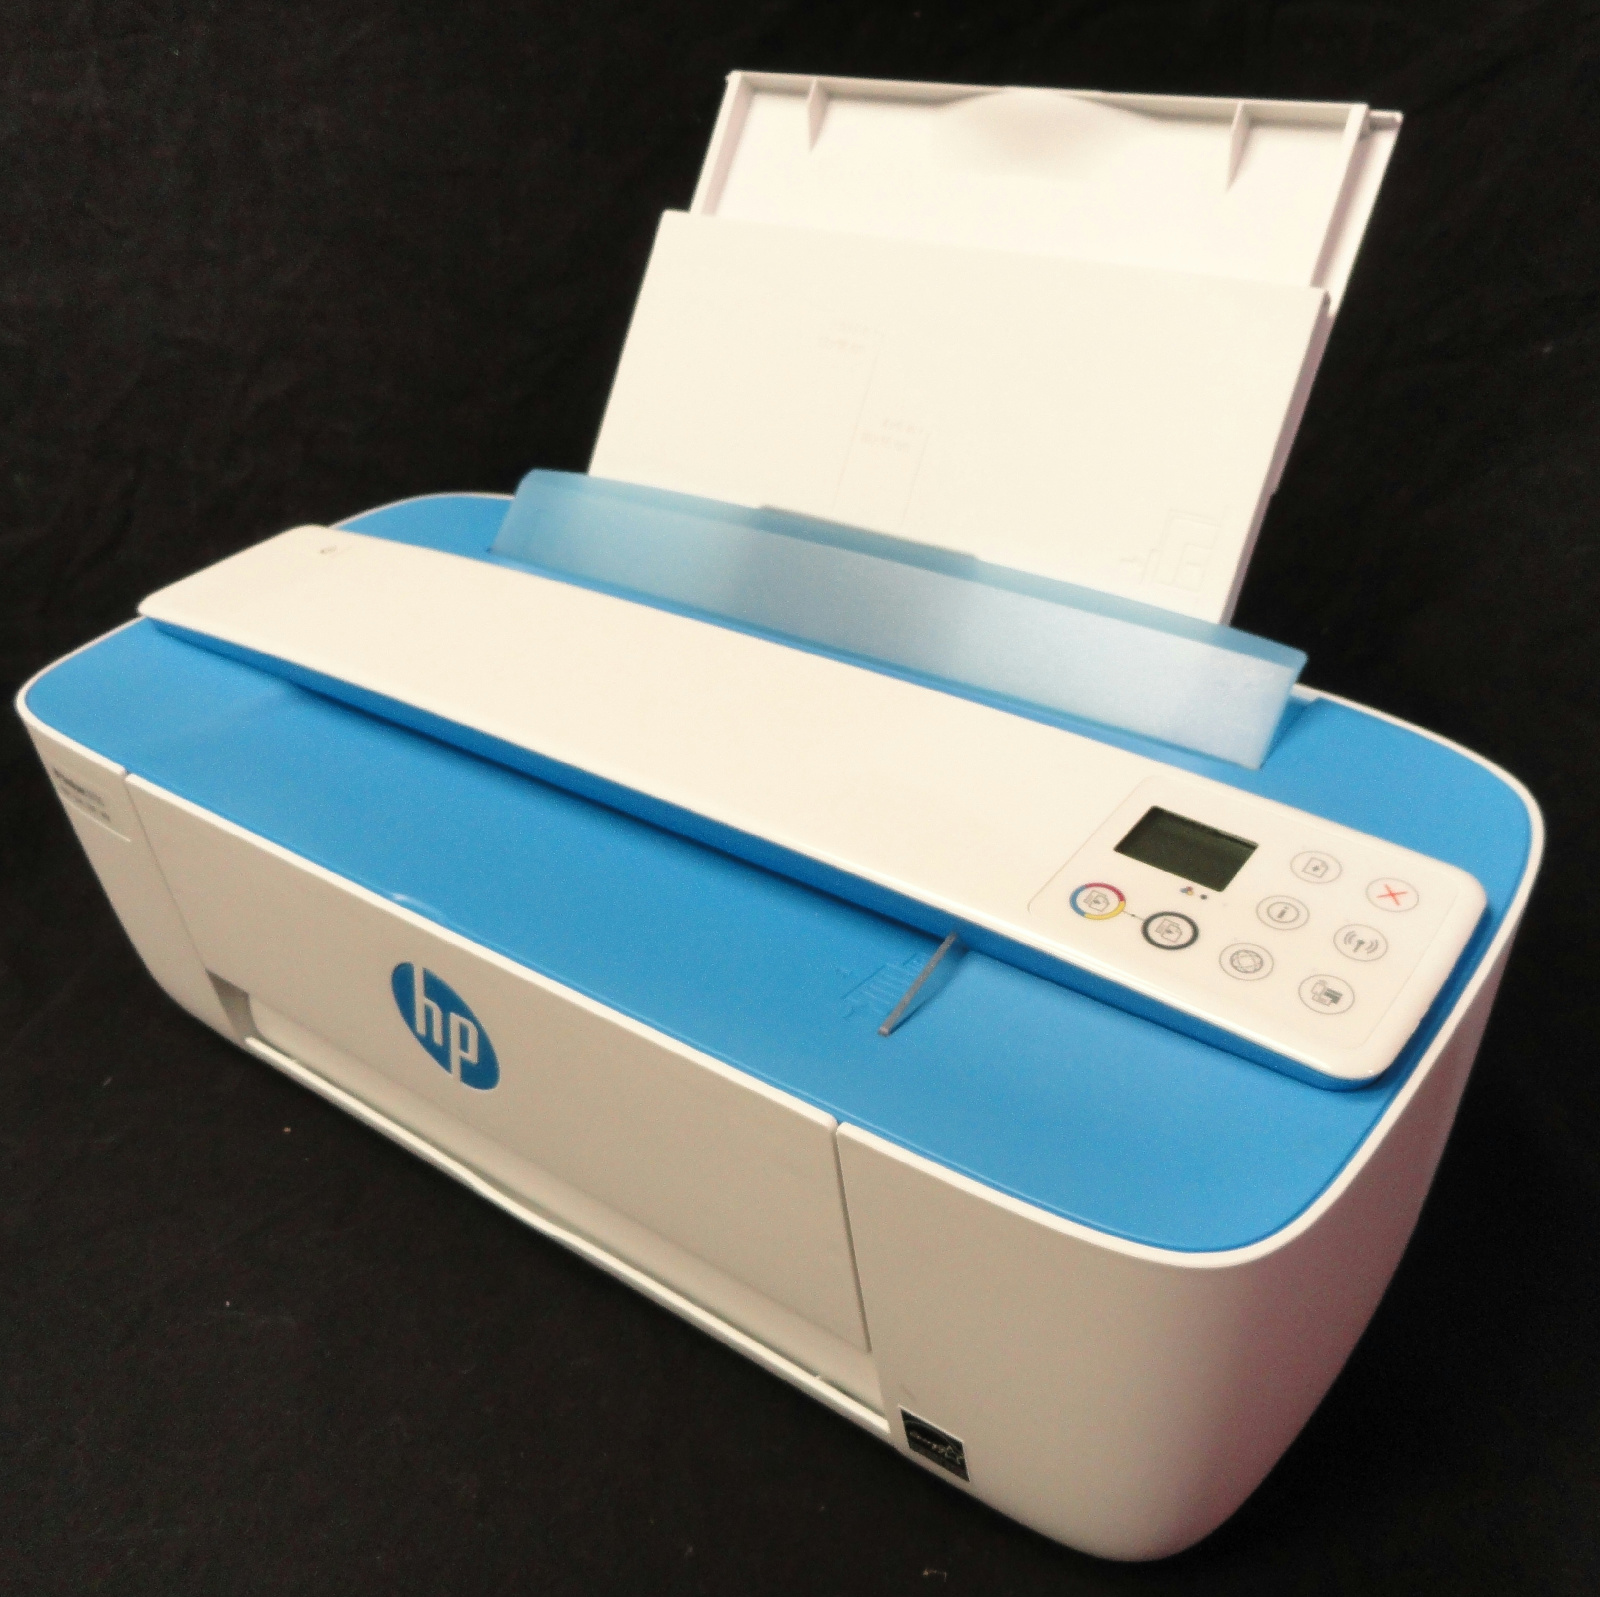 HP DeskJet 3755 All-in-One Printer   w/ Color & Black Ink ...